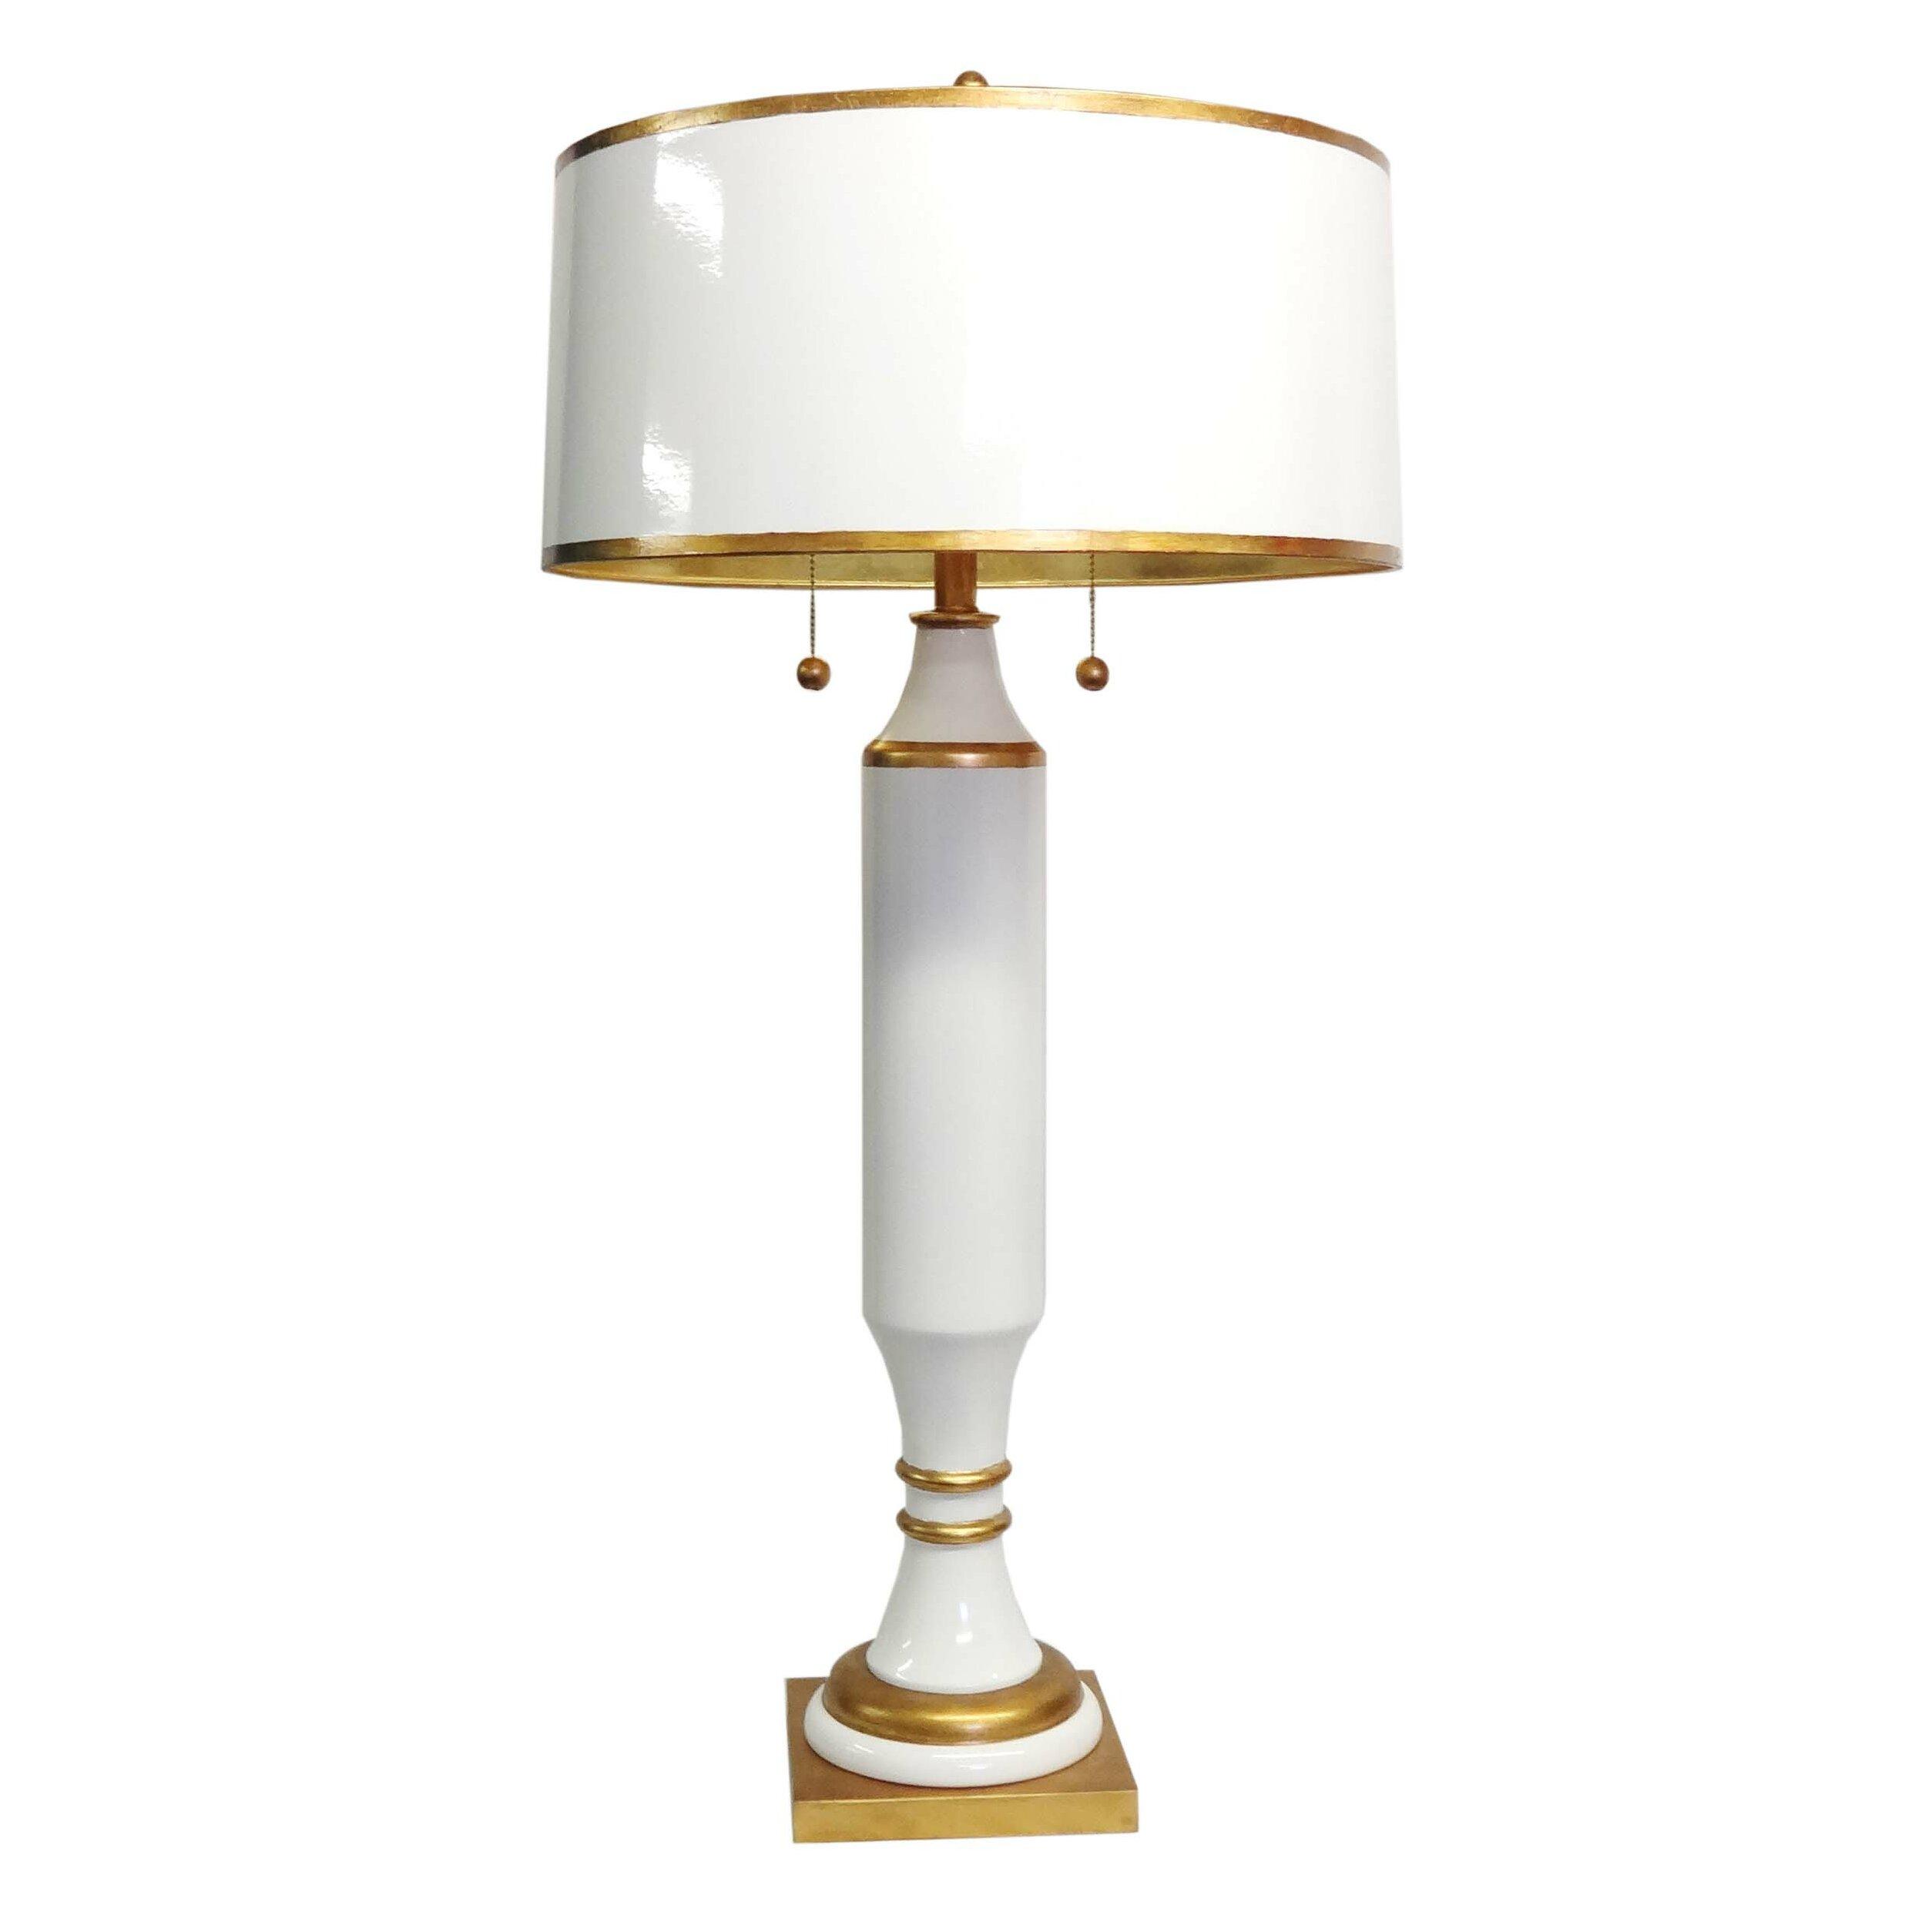 tall 40 h table lamp wayfair. Black Bedroom Furniture Sets. Home Design Ideas